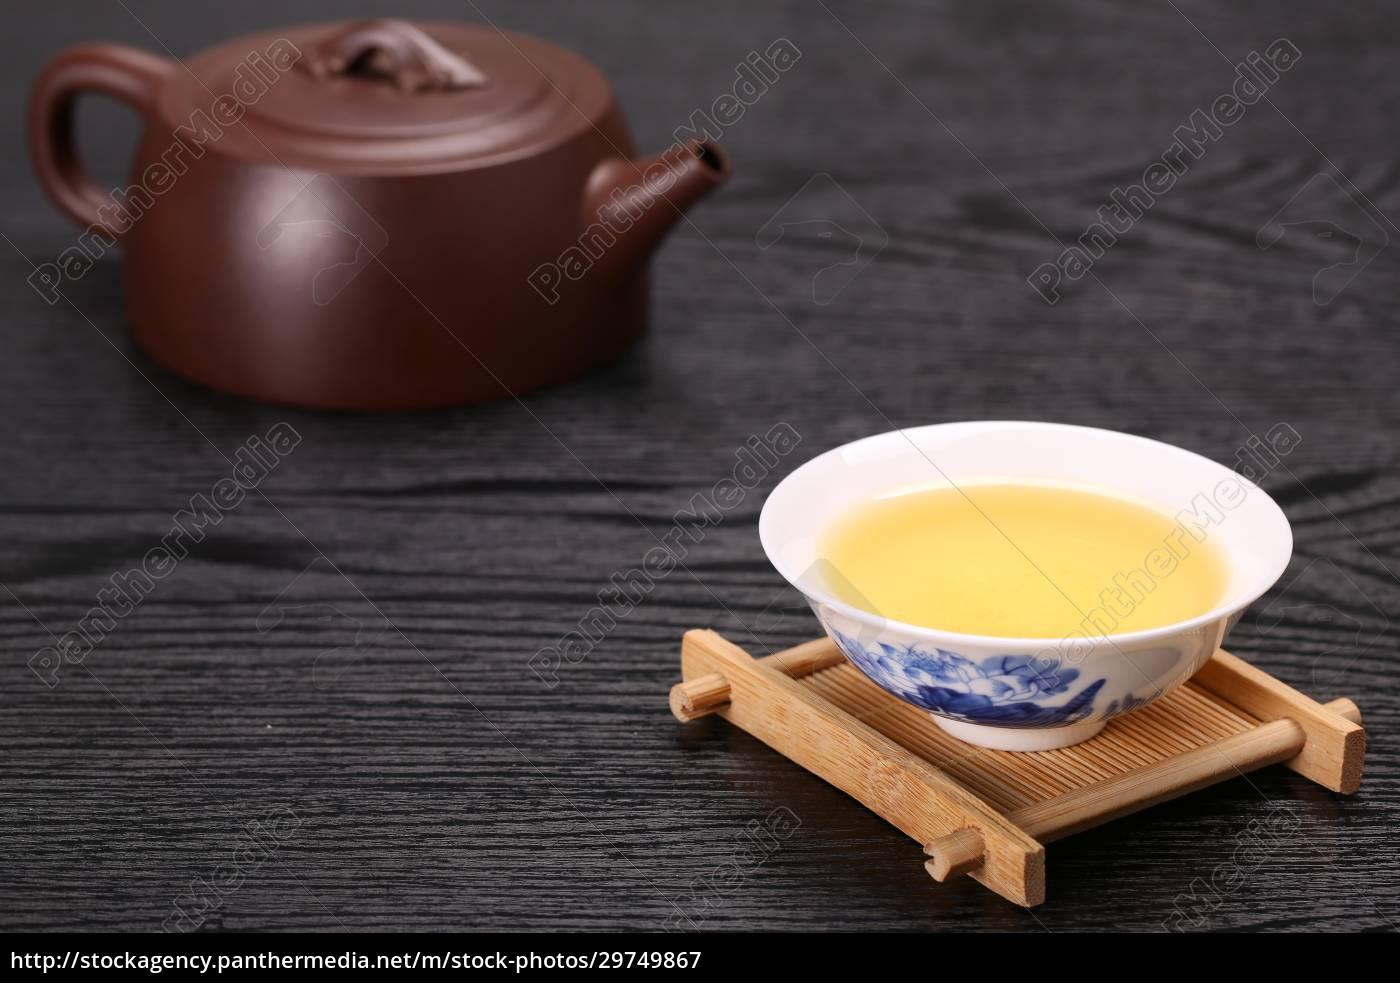 china's, tea, culture - 29749867